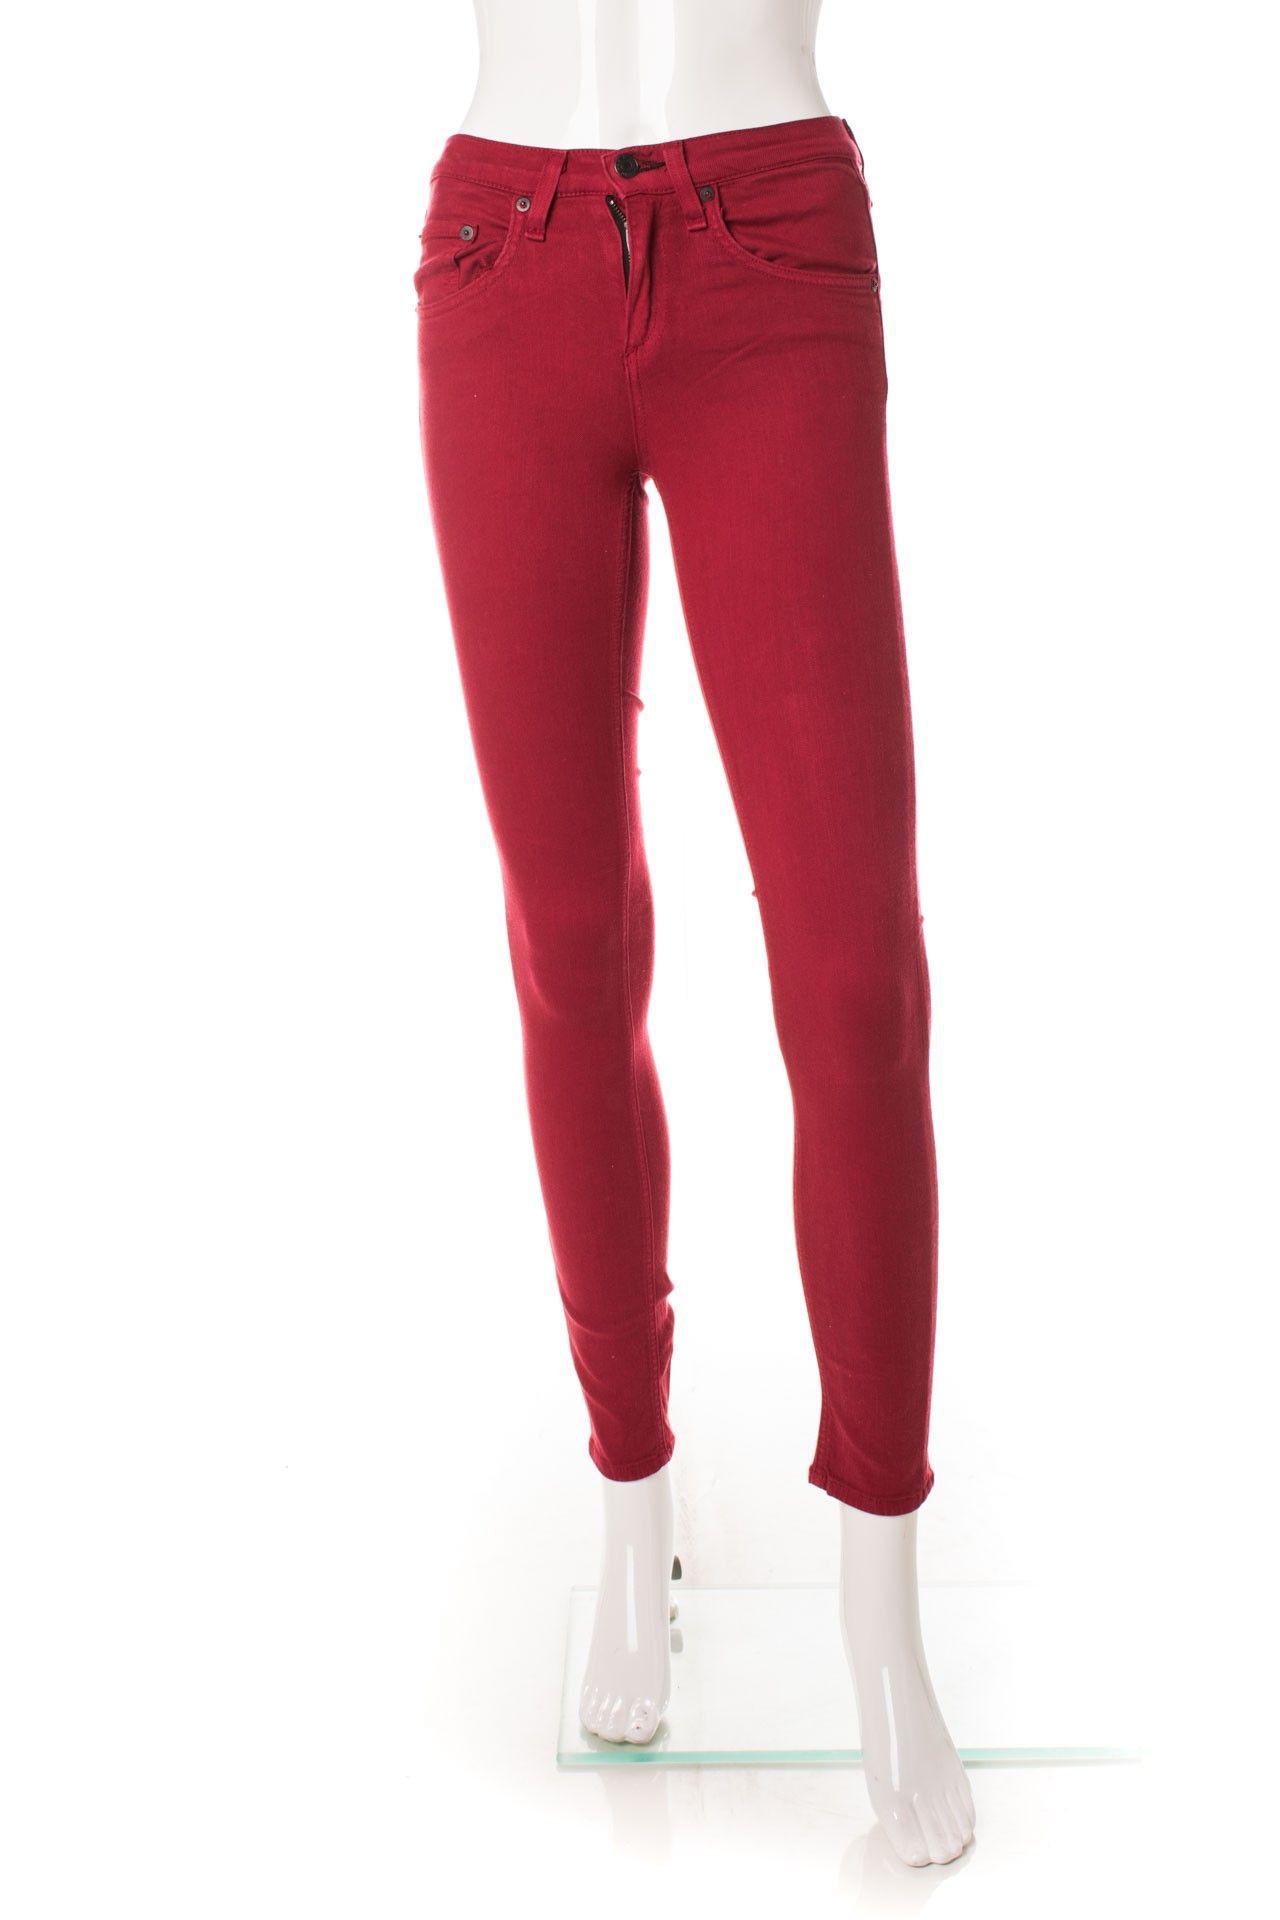 Rag & Bone - Calça Skinny Red - Foto 1